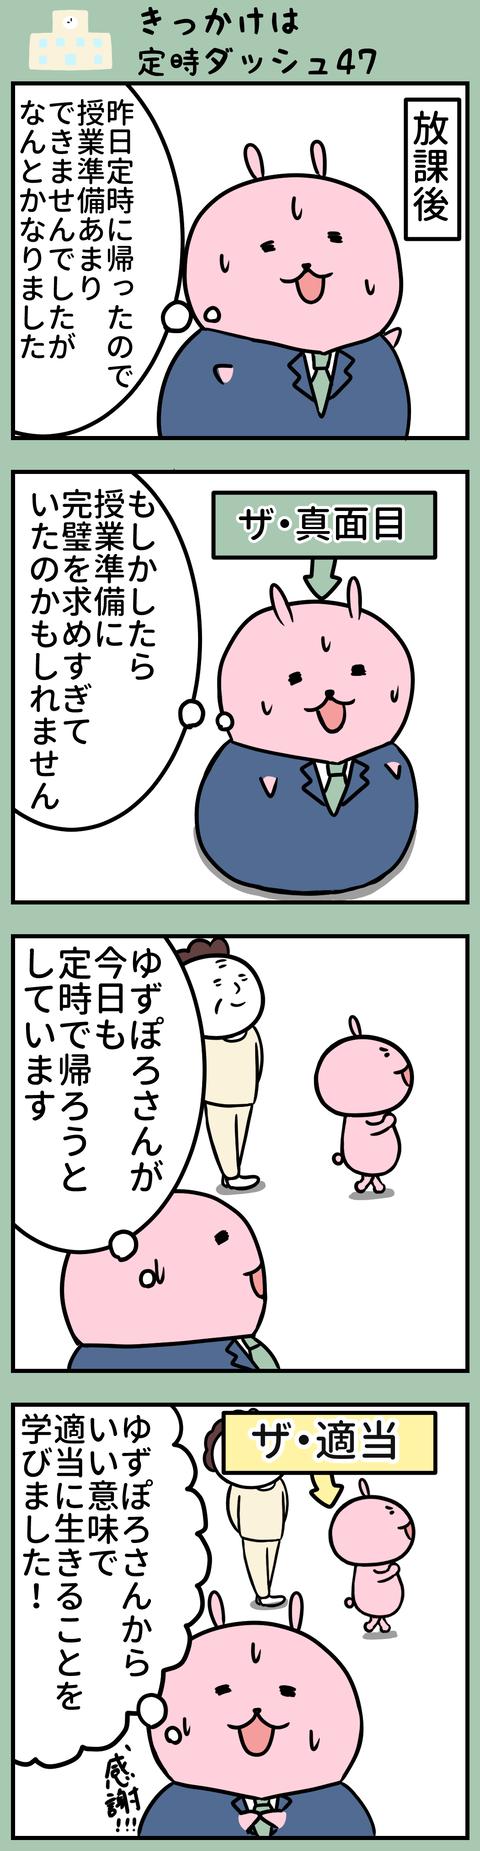 manga-yuzuporo120-1